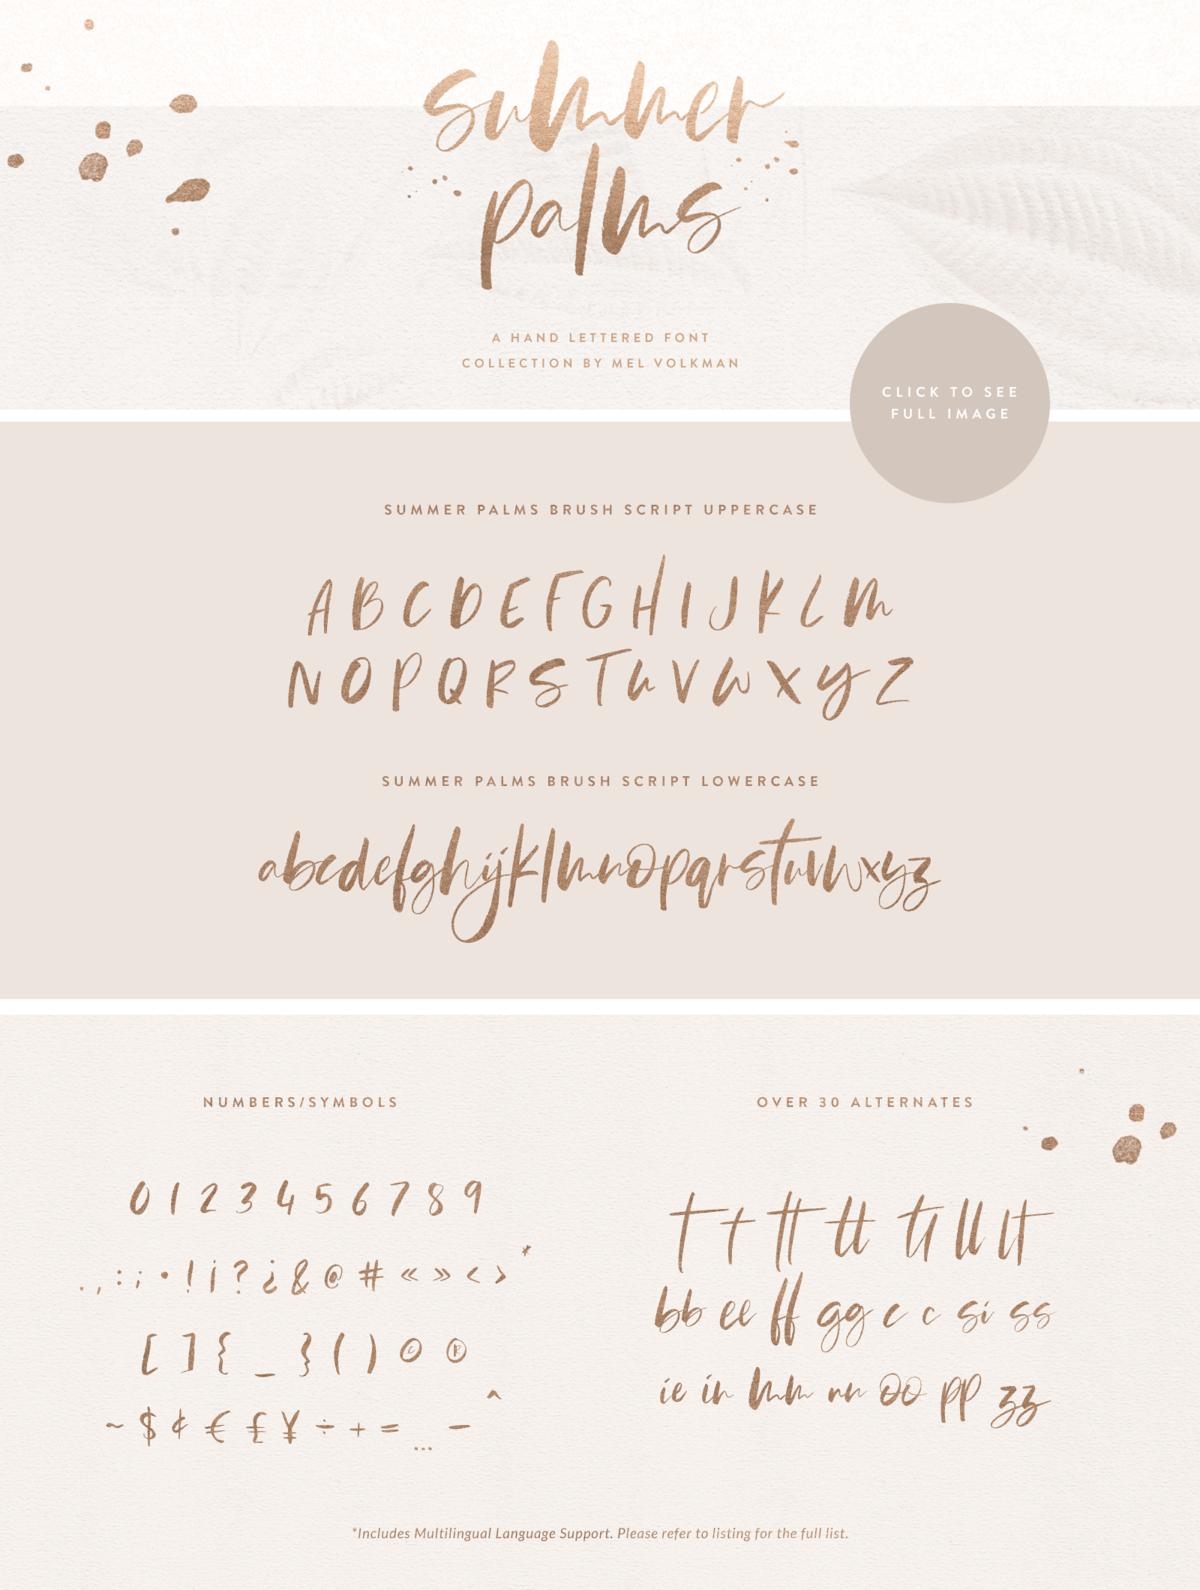 Summer Palms Hand Lettered Brush Script Font By Mel Volkman Hand Lettered Sans Serif Realistic High Res Watercolor Brush Script Fonts Lettering Fonts Lettering